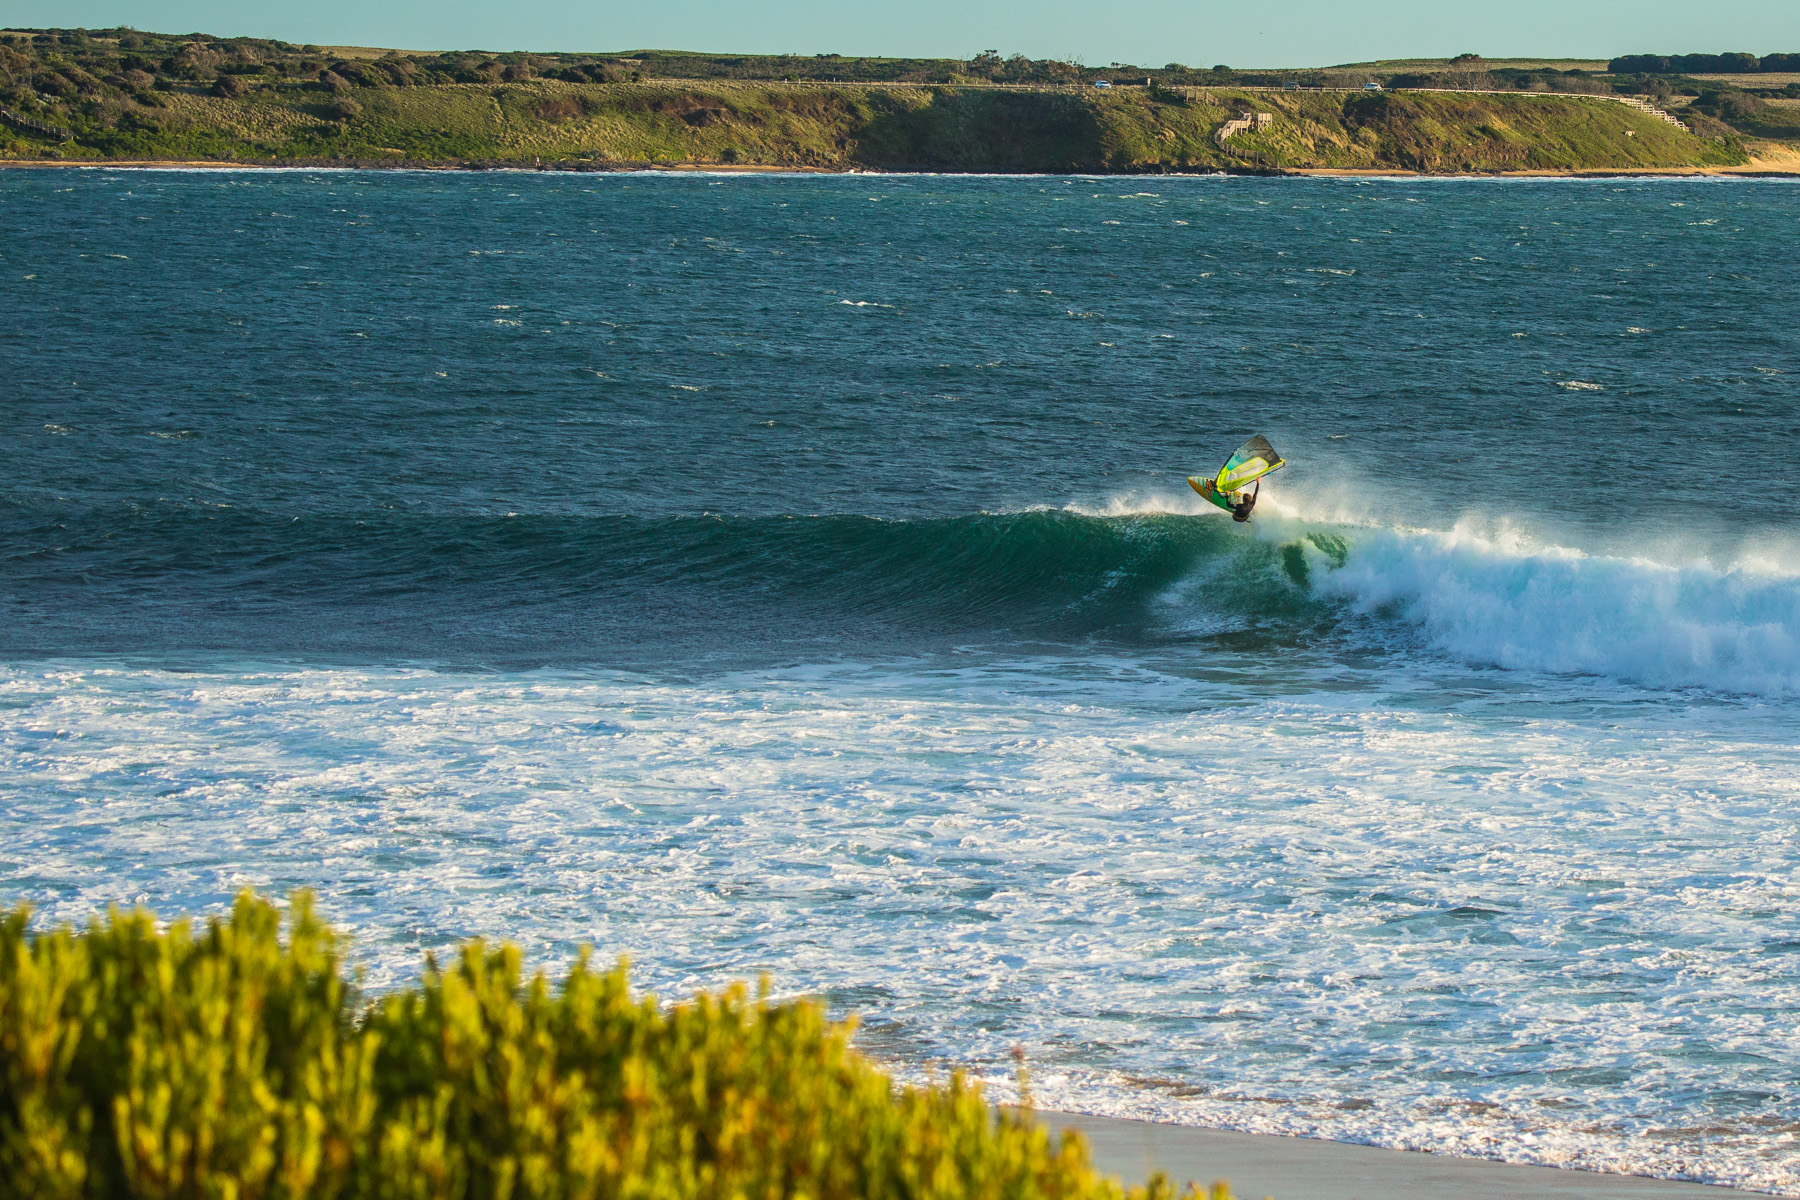 windsurfing wavesailing at flynns reef phillip island